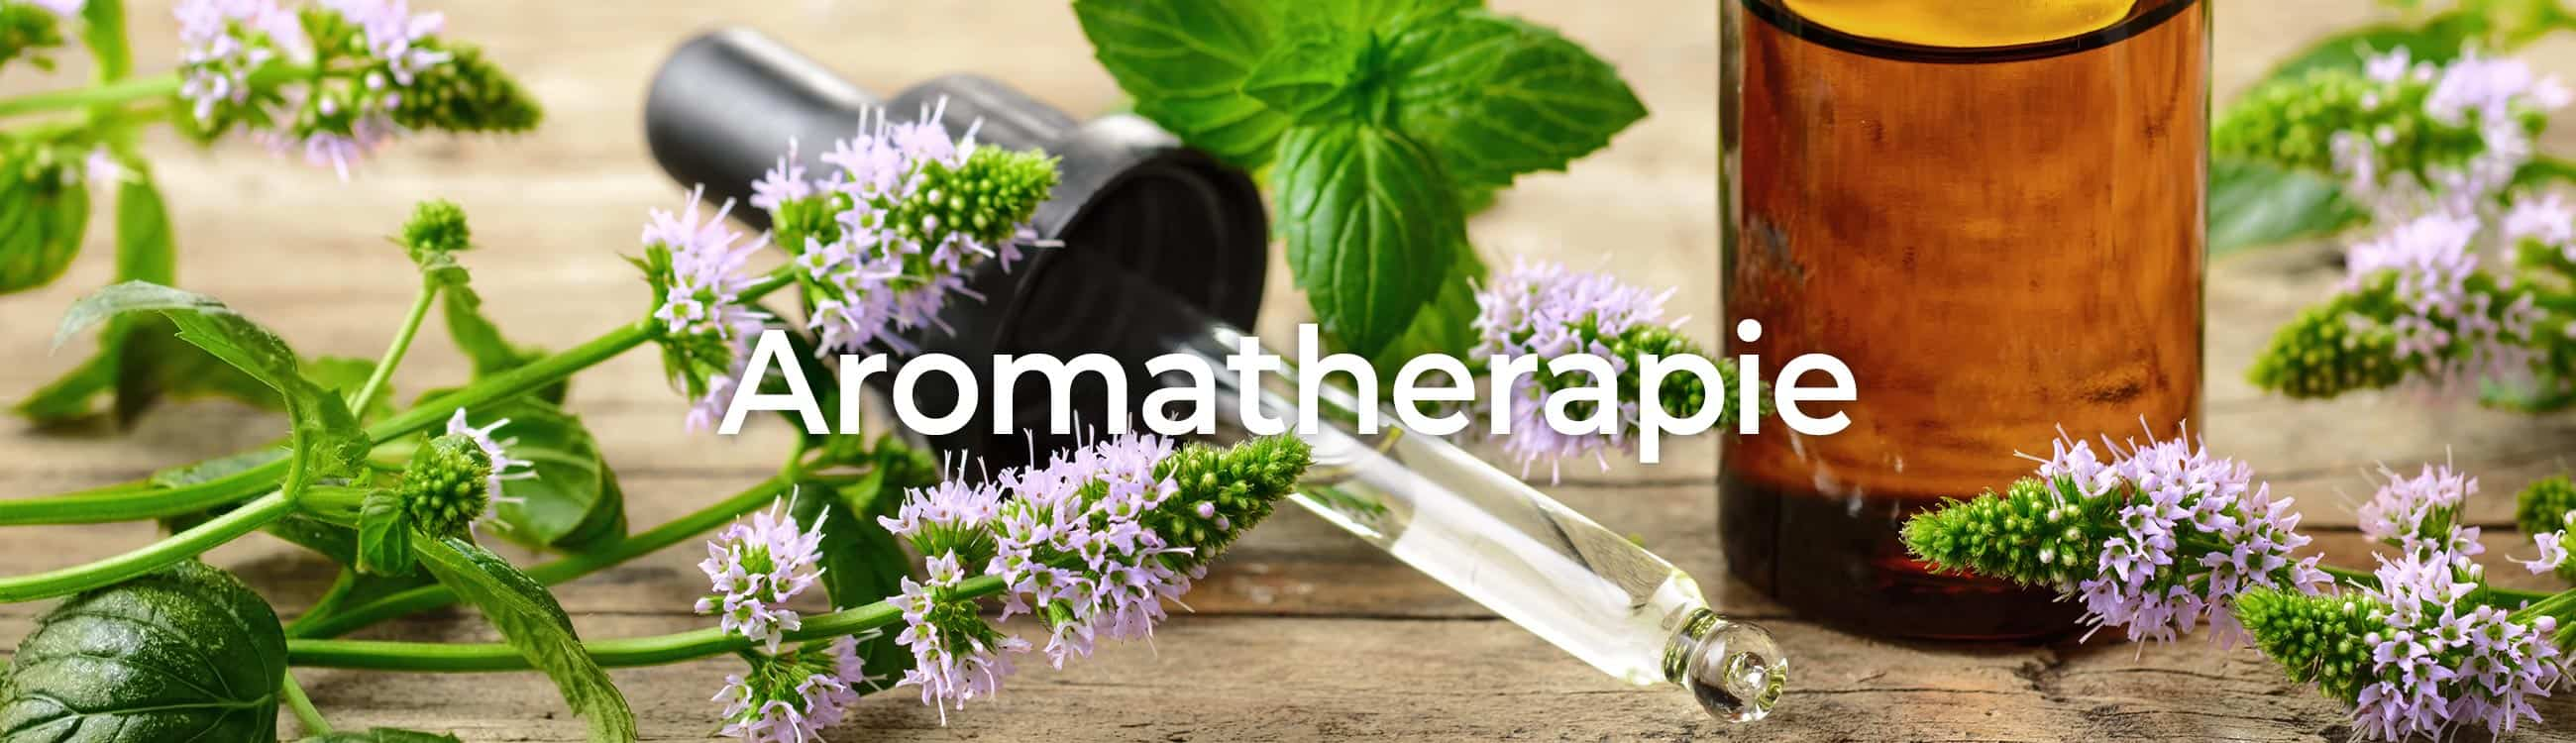 cover-aromatherapie-2-new